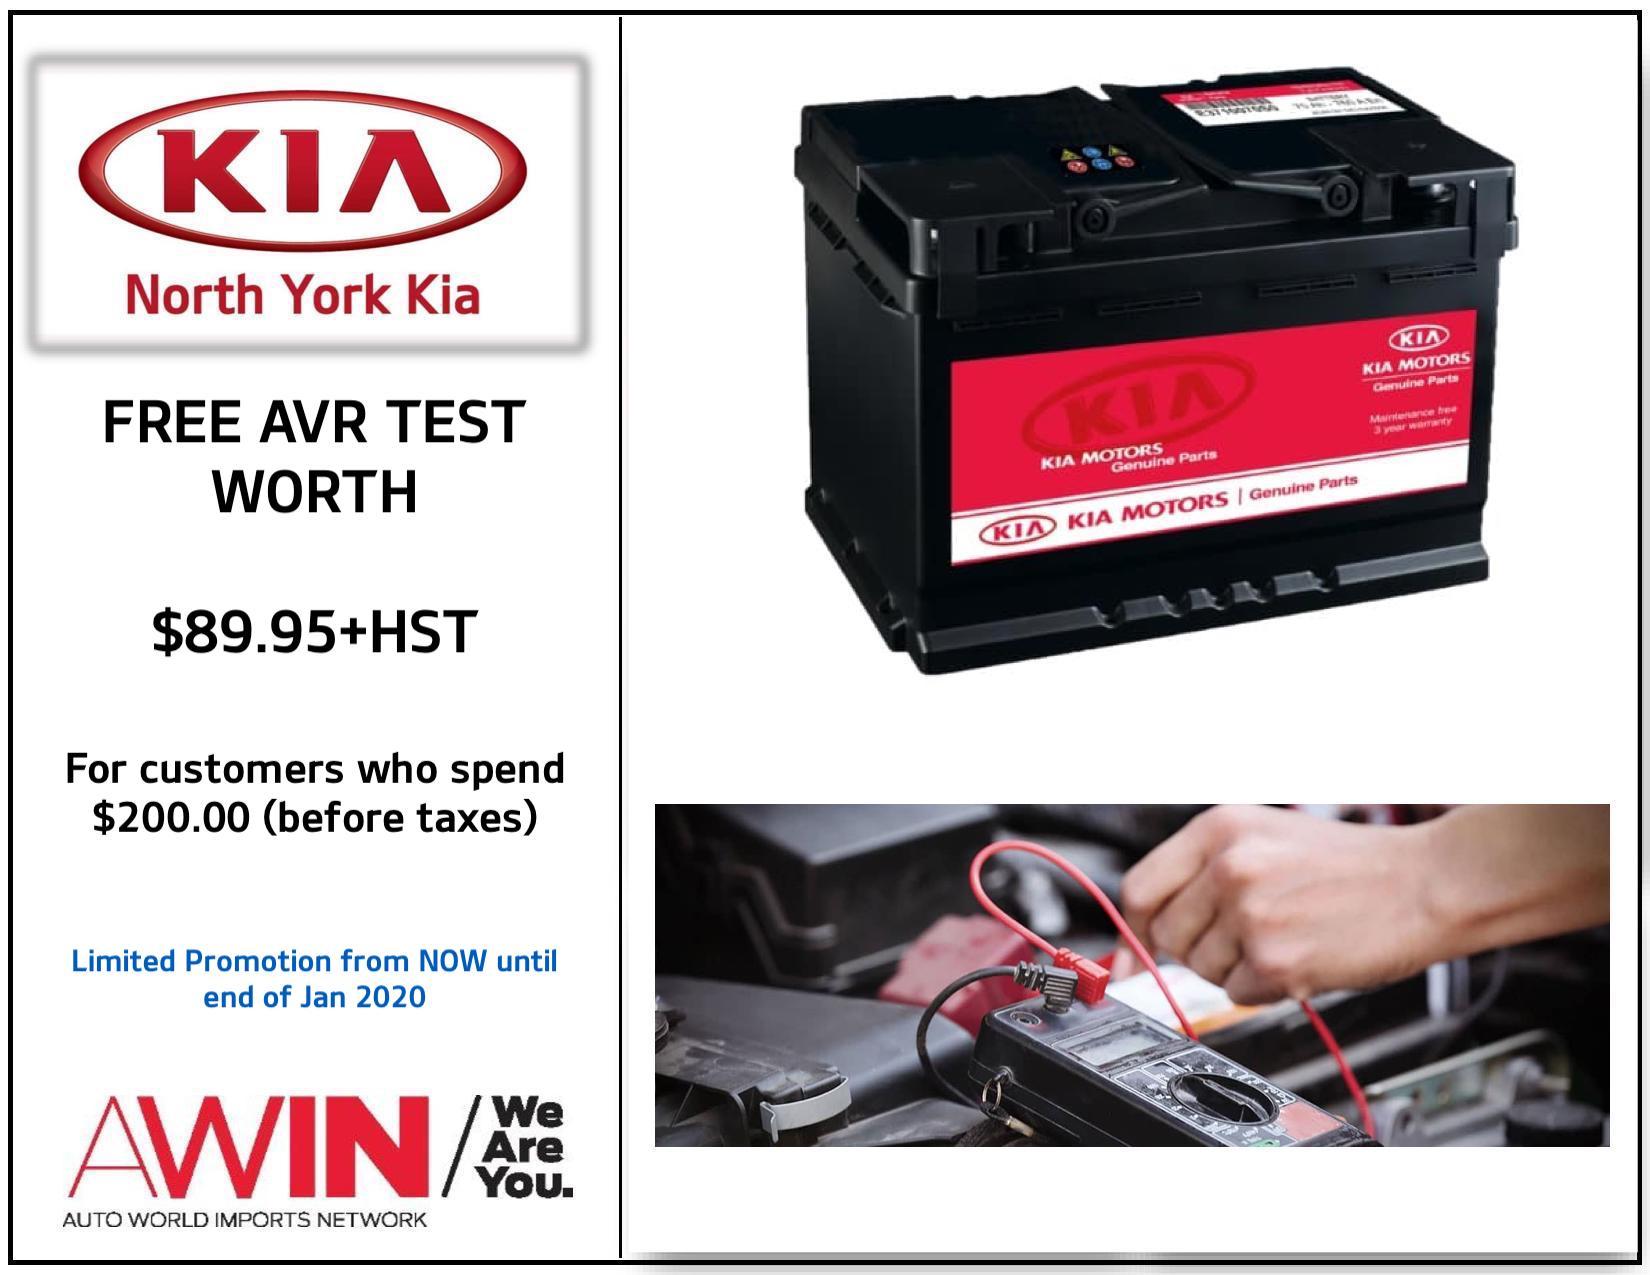 Free AVR Test